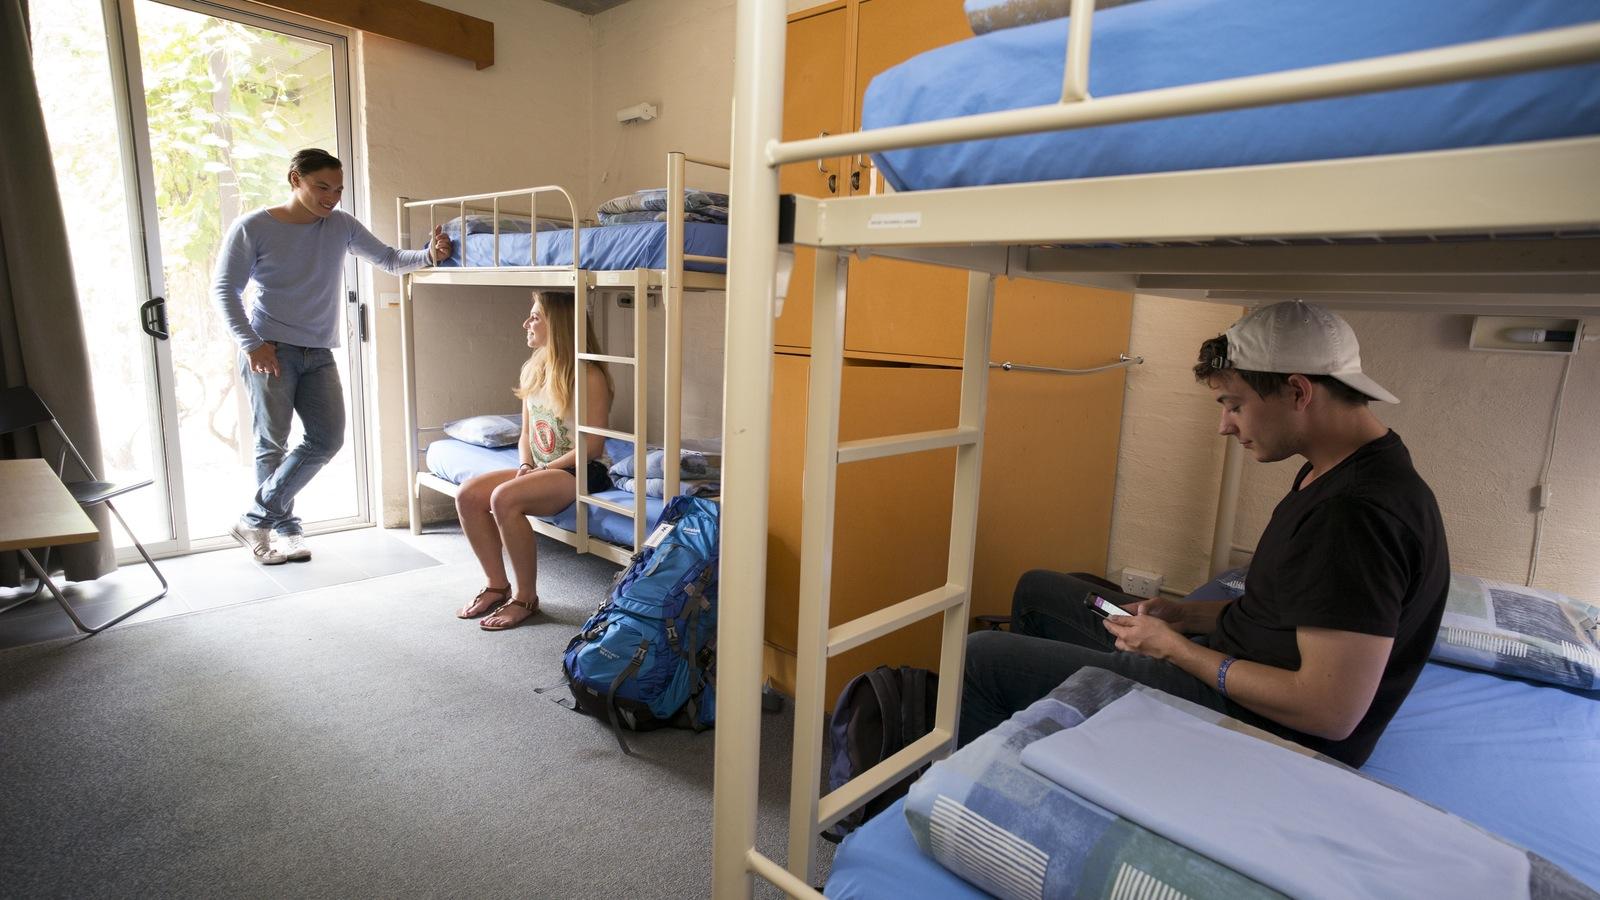 4 share room